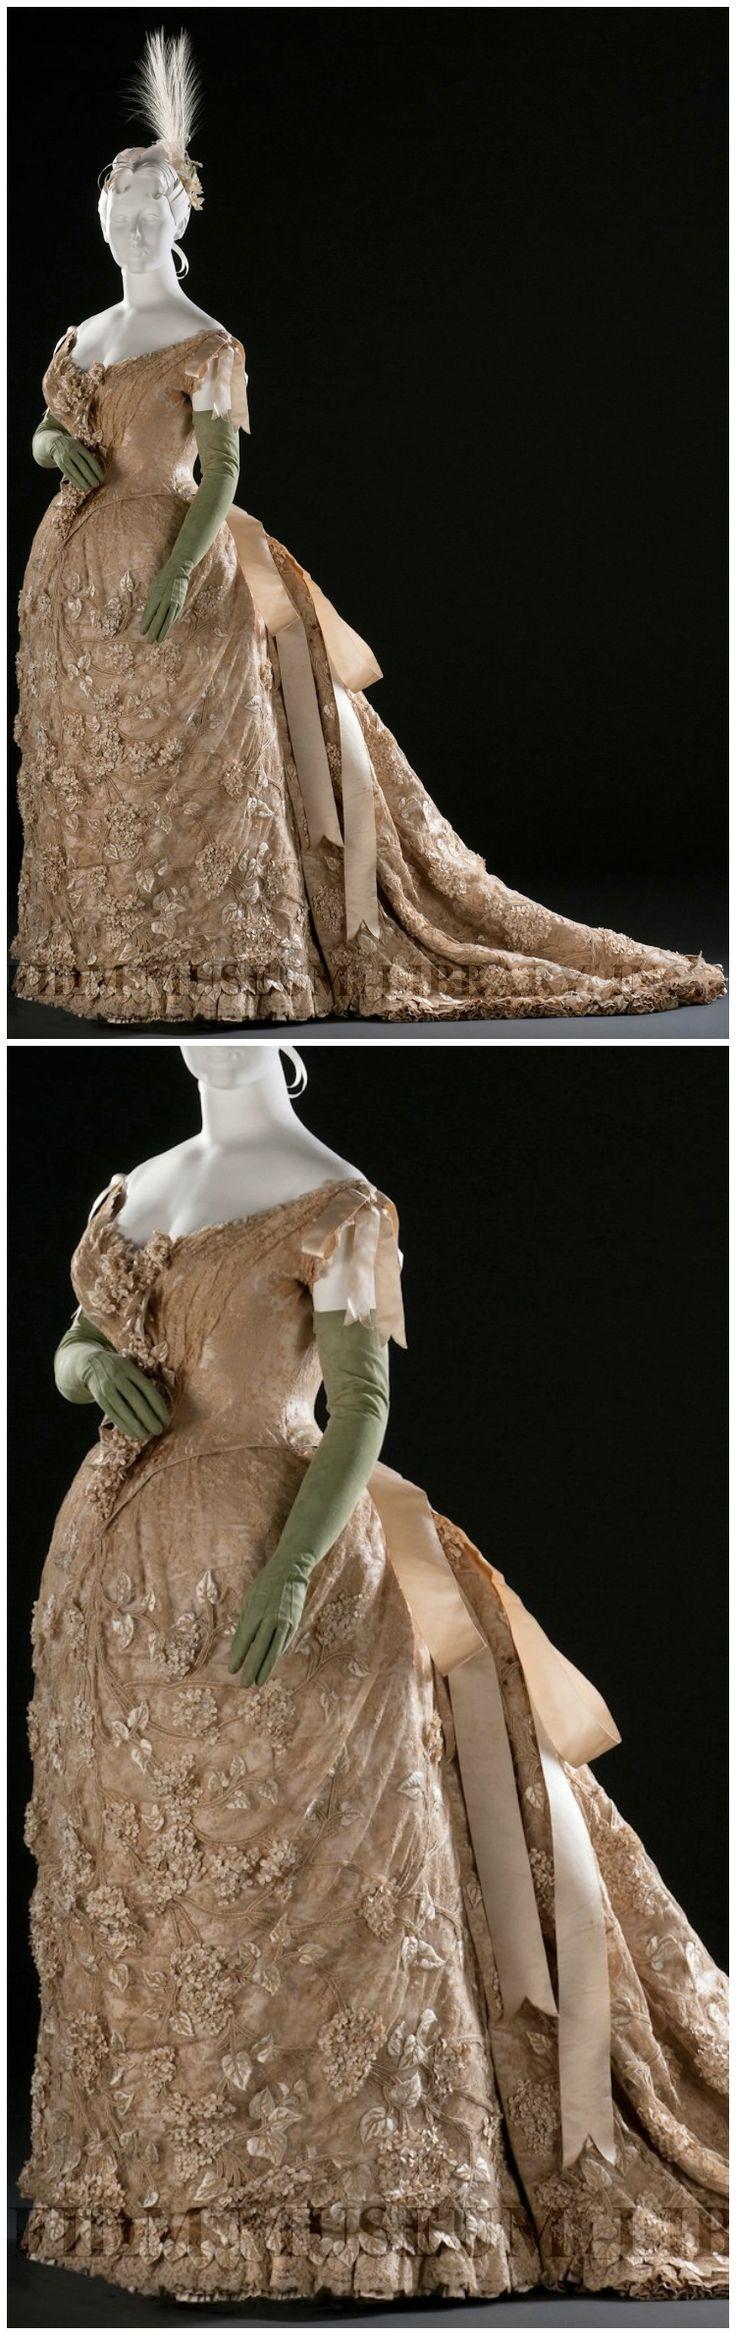 Opera Gown, by Maison Félix, Paris, c. 1887, Helen Larson Historic Fashion Collection, via the FIDM Museum Blog. Worn by Countess Craven as her wedding dress.